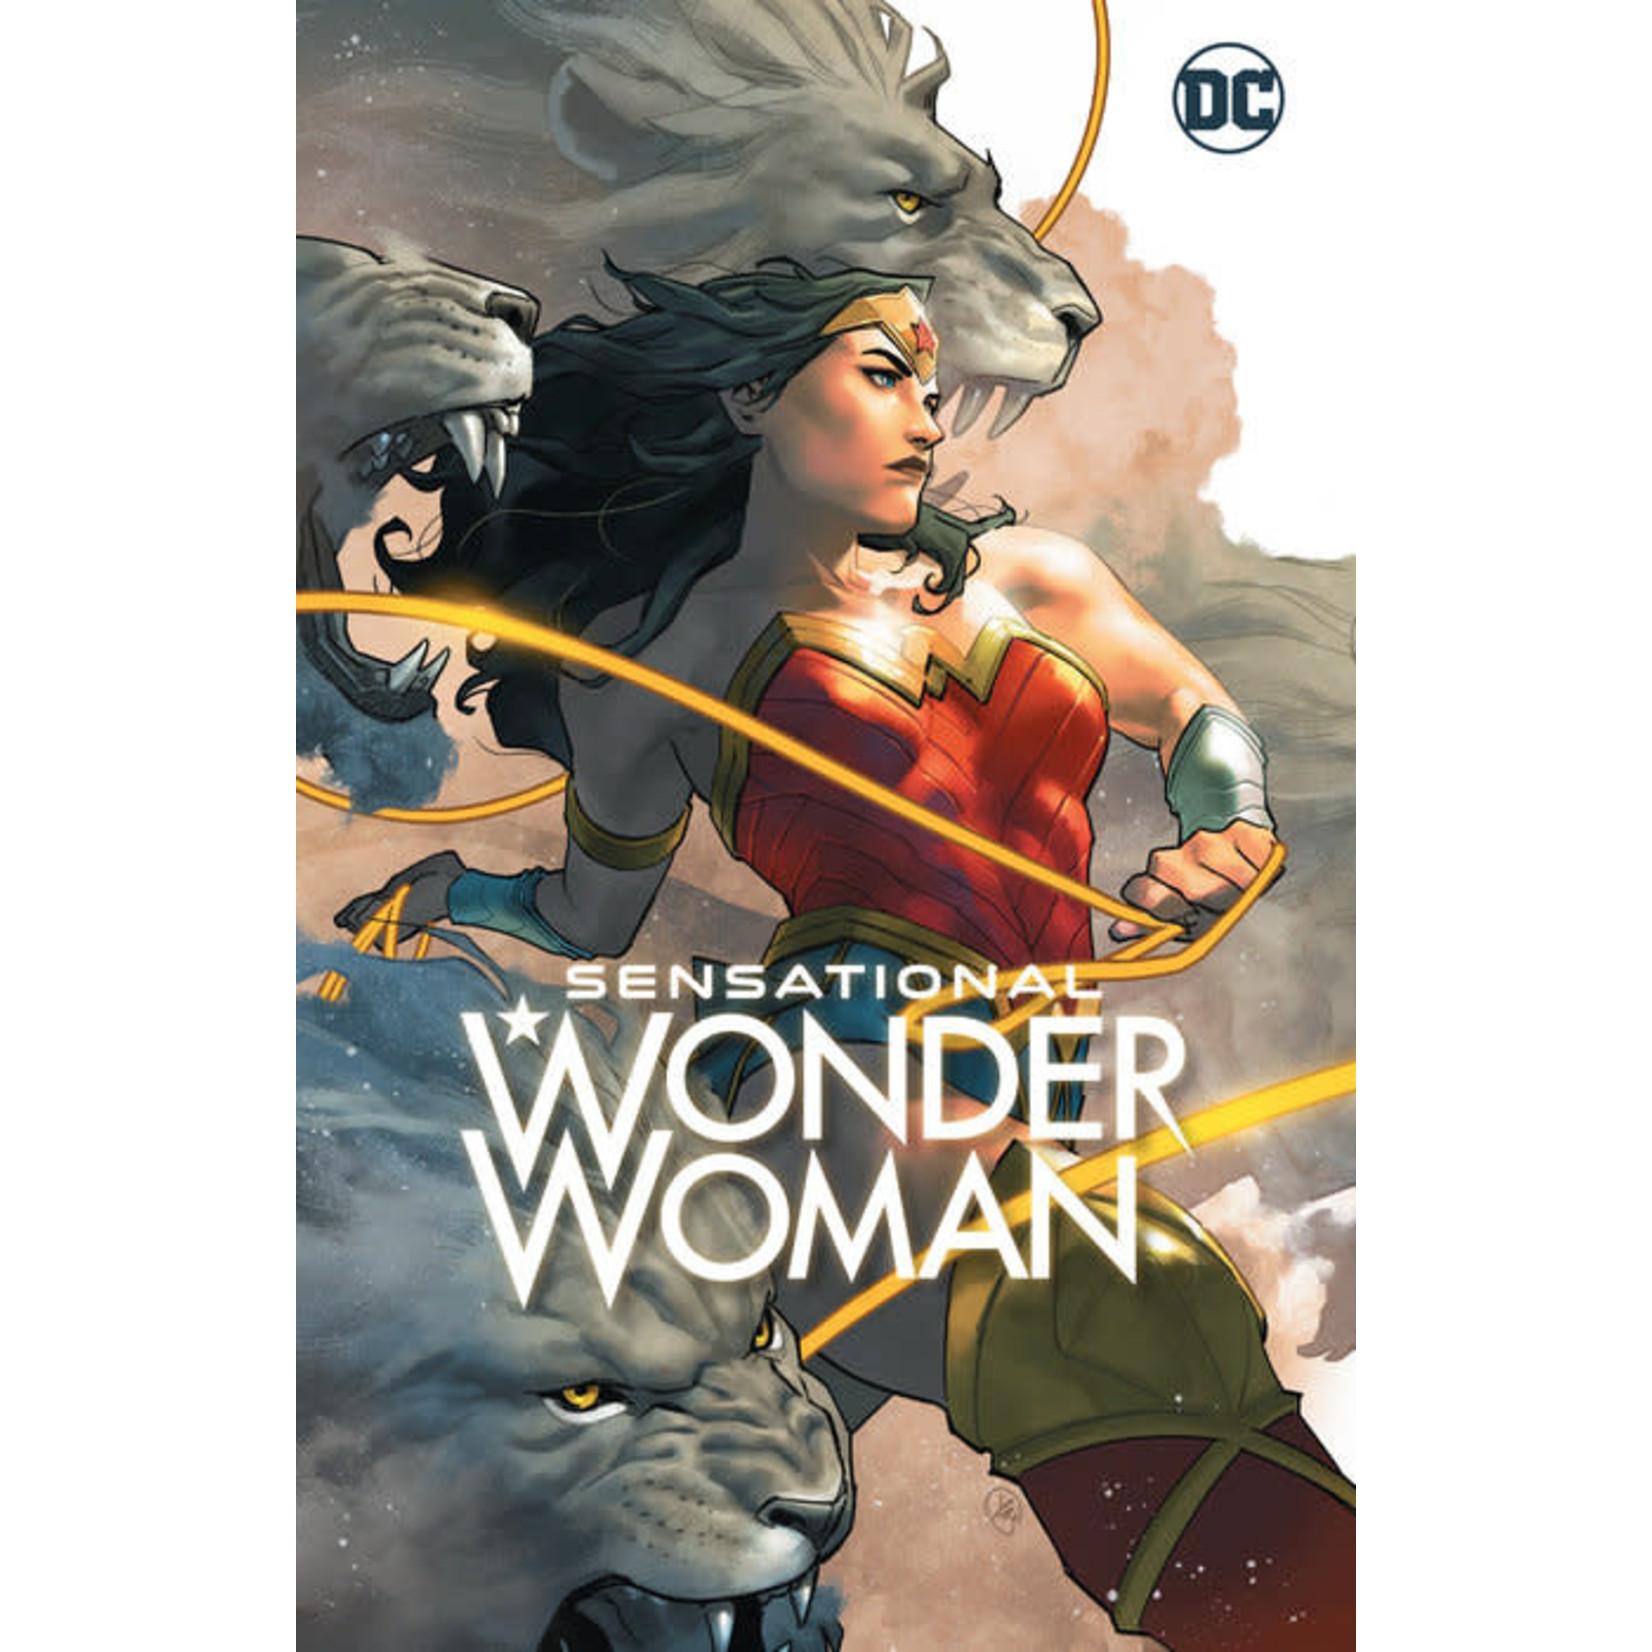 DC Comics Sensational Wonder Woman Volume 1 TP